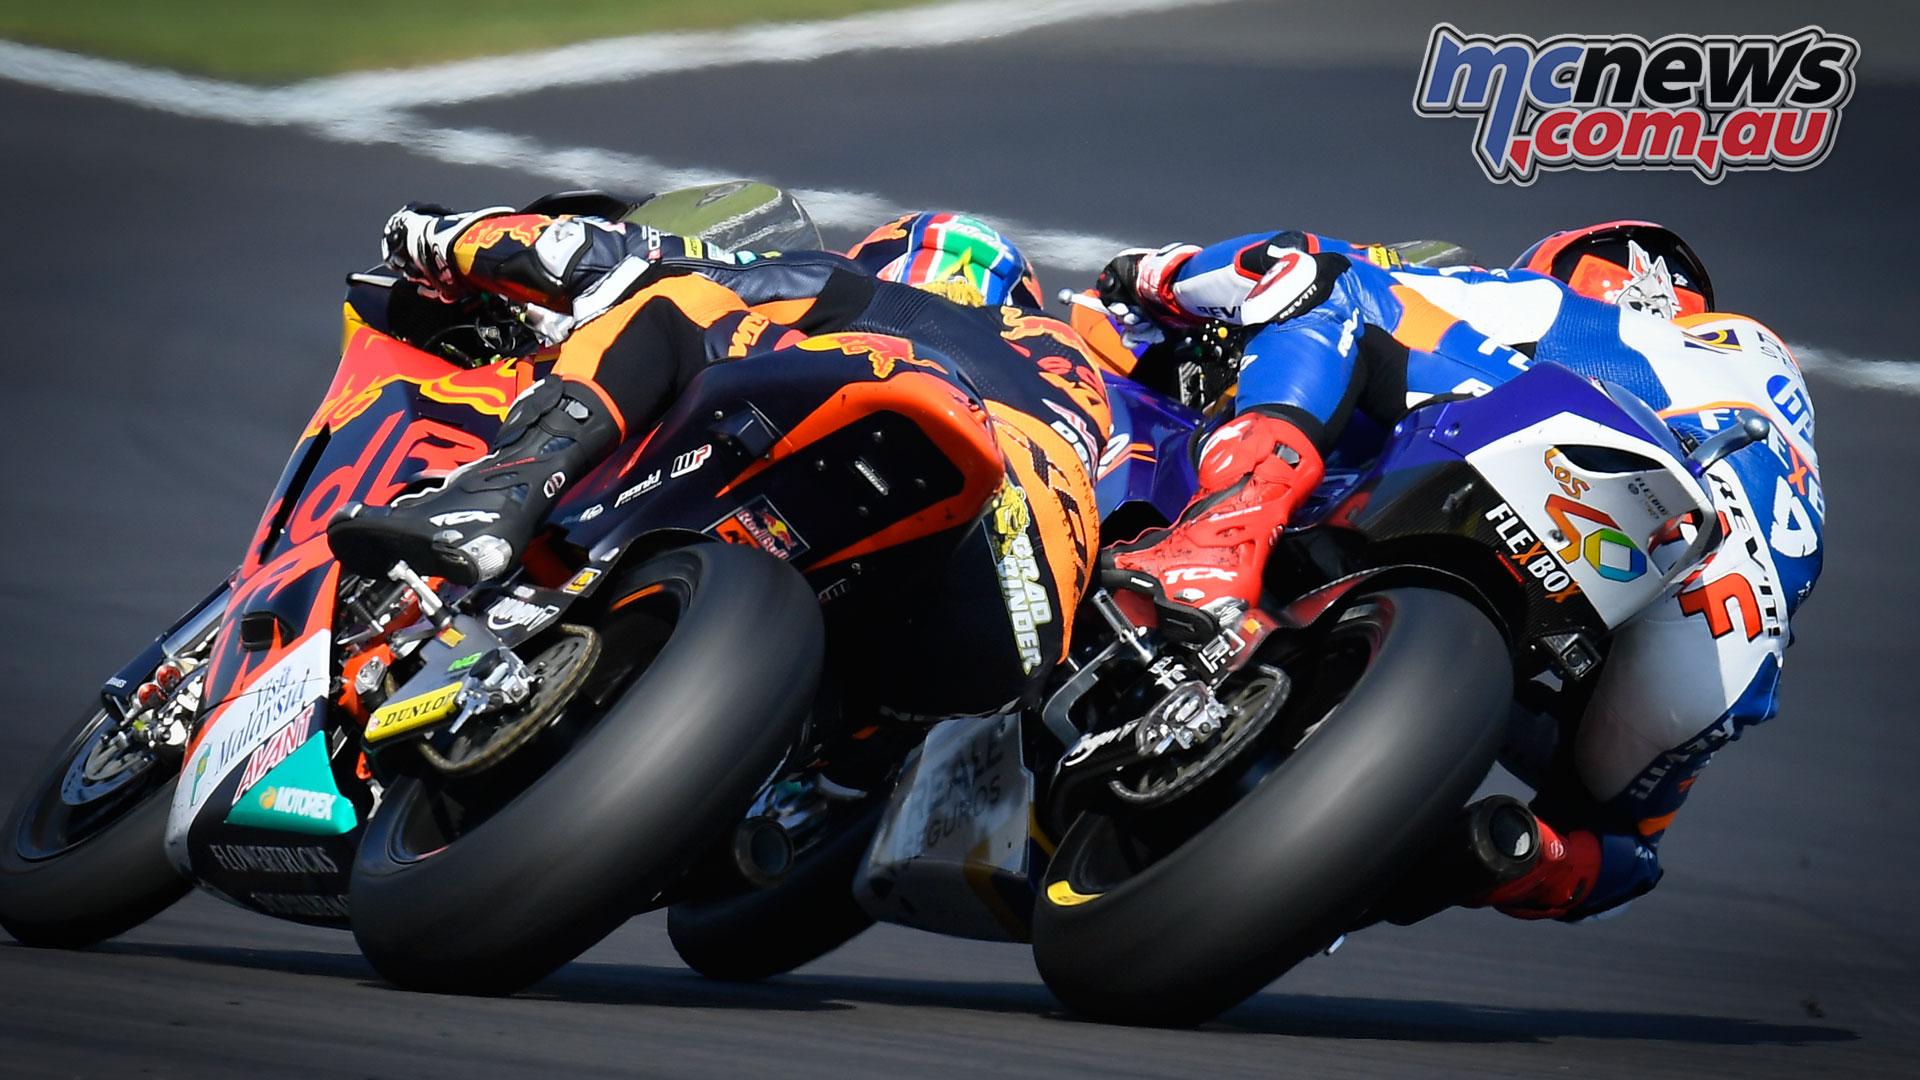 MotoGP Rnd Silverstone Moto Fernandez